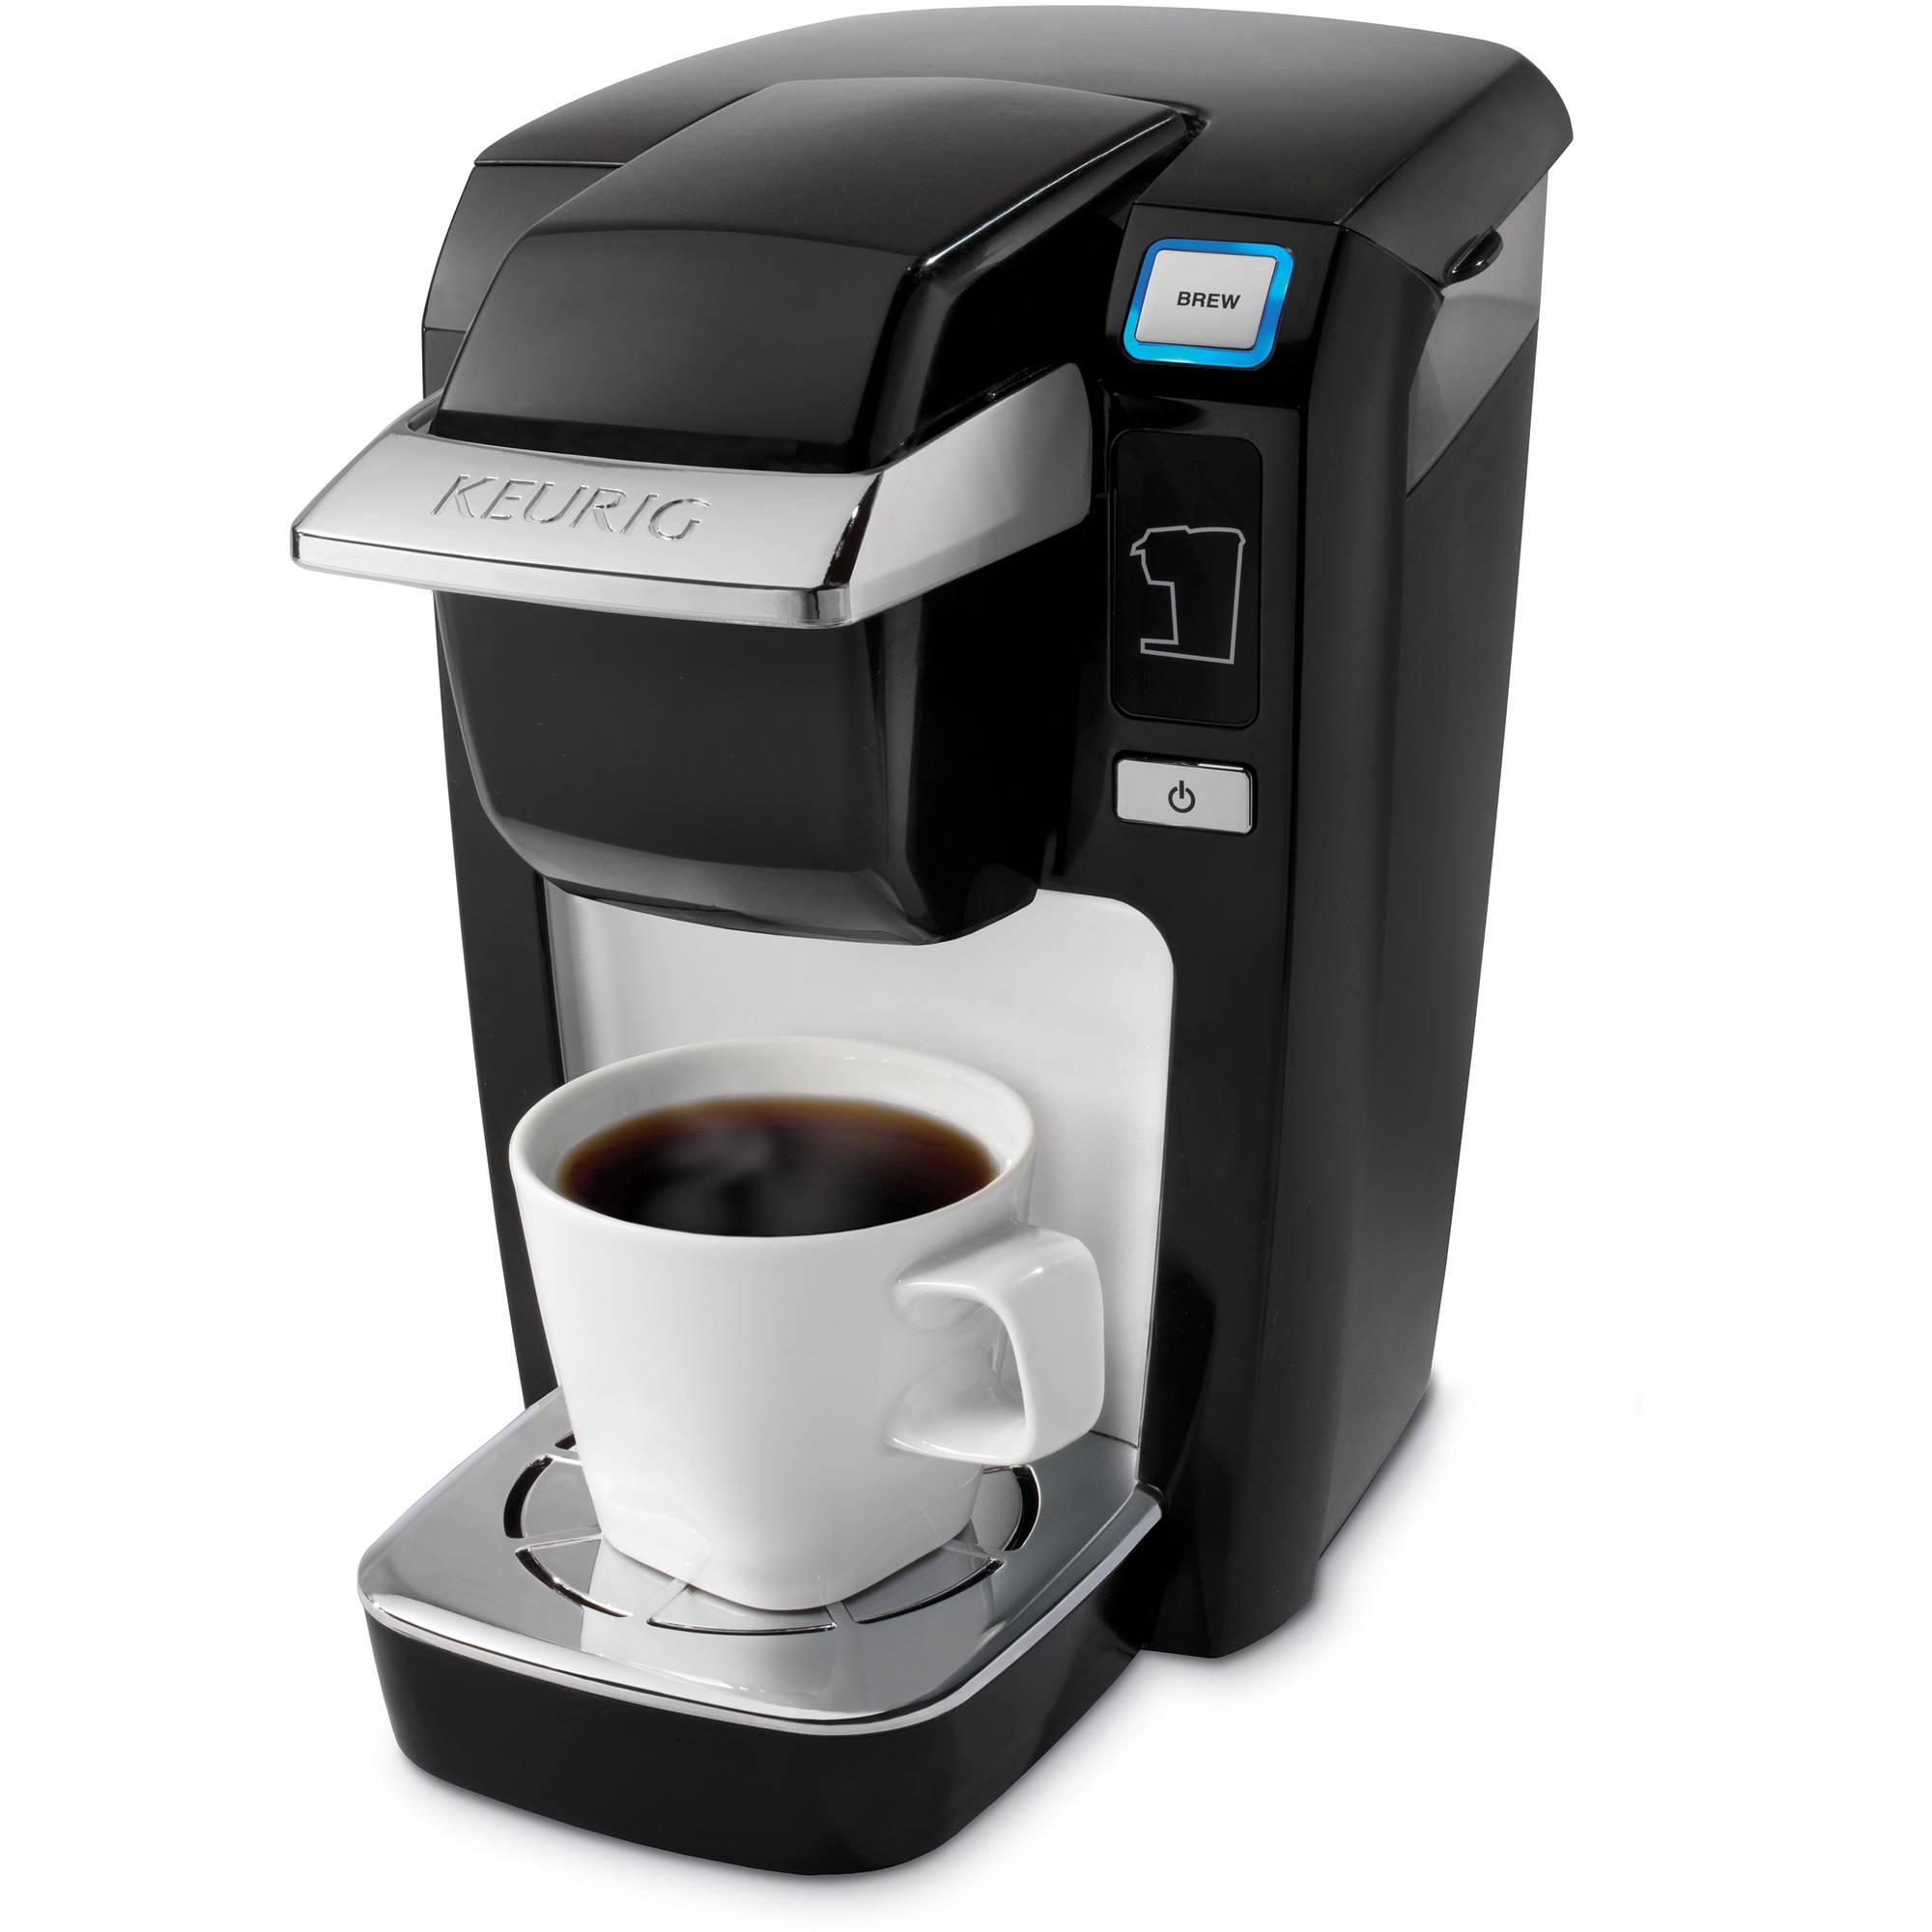 Download free pdf for keurig elite b40 coffee maker manual.